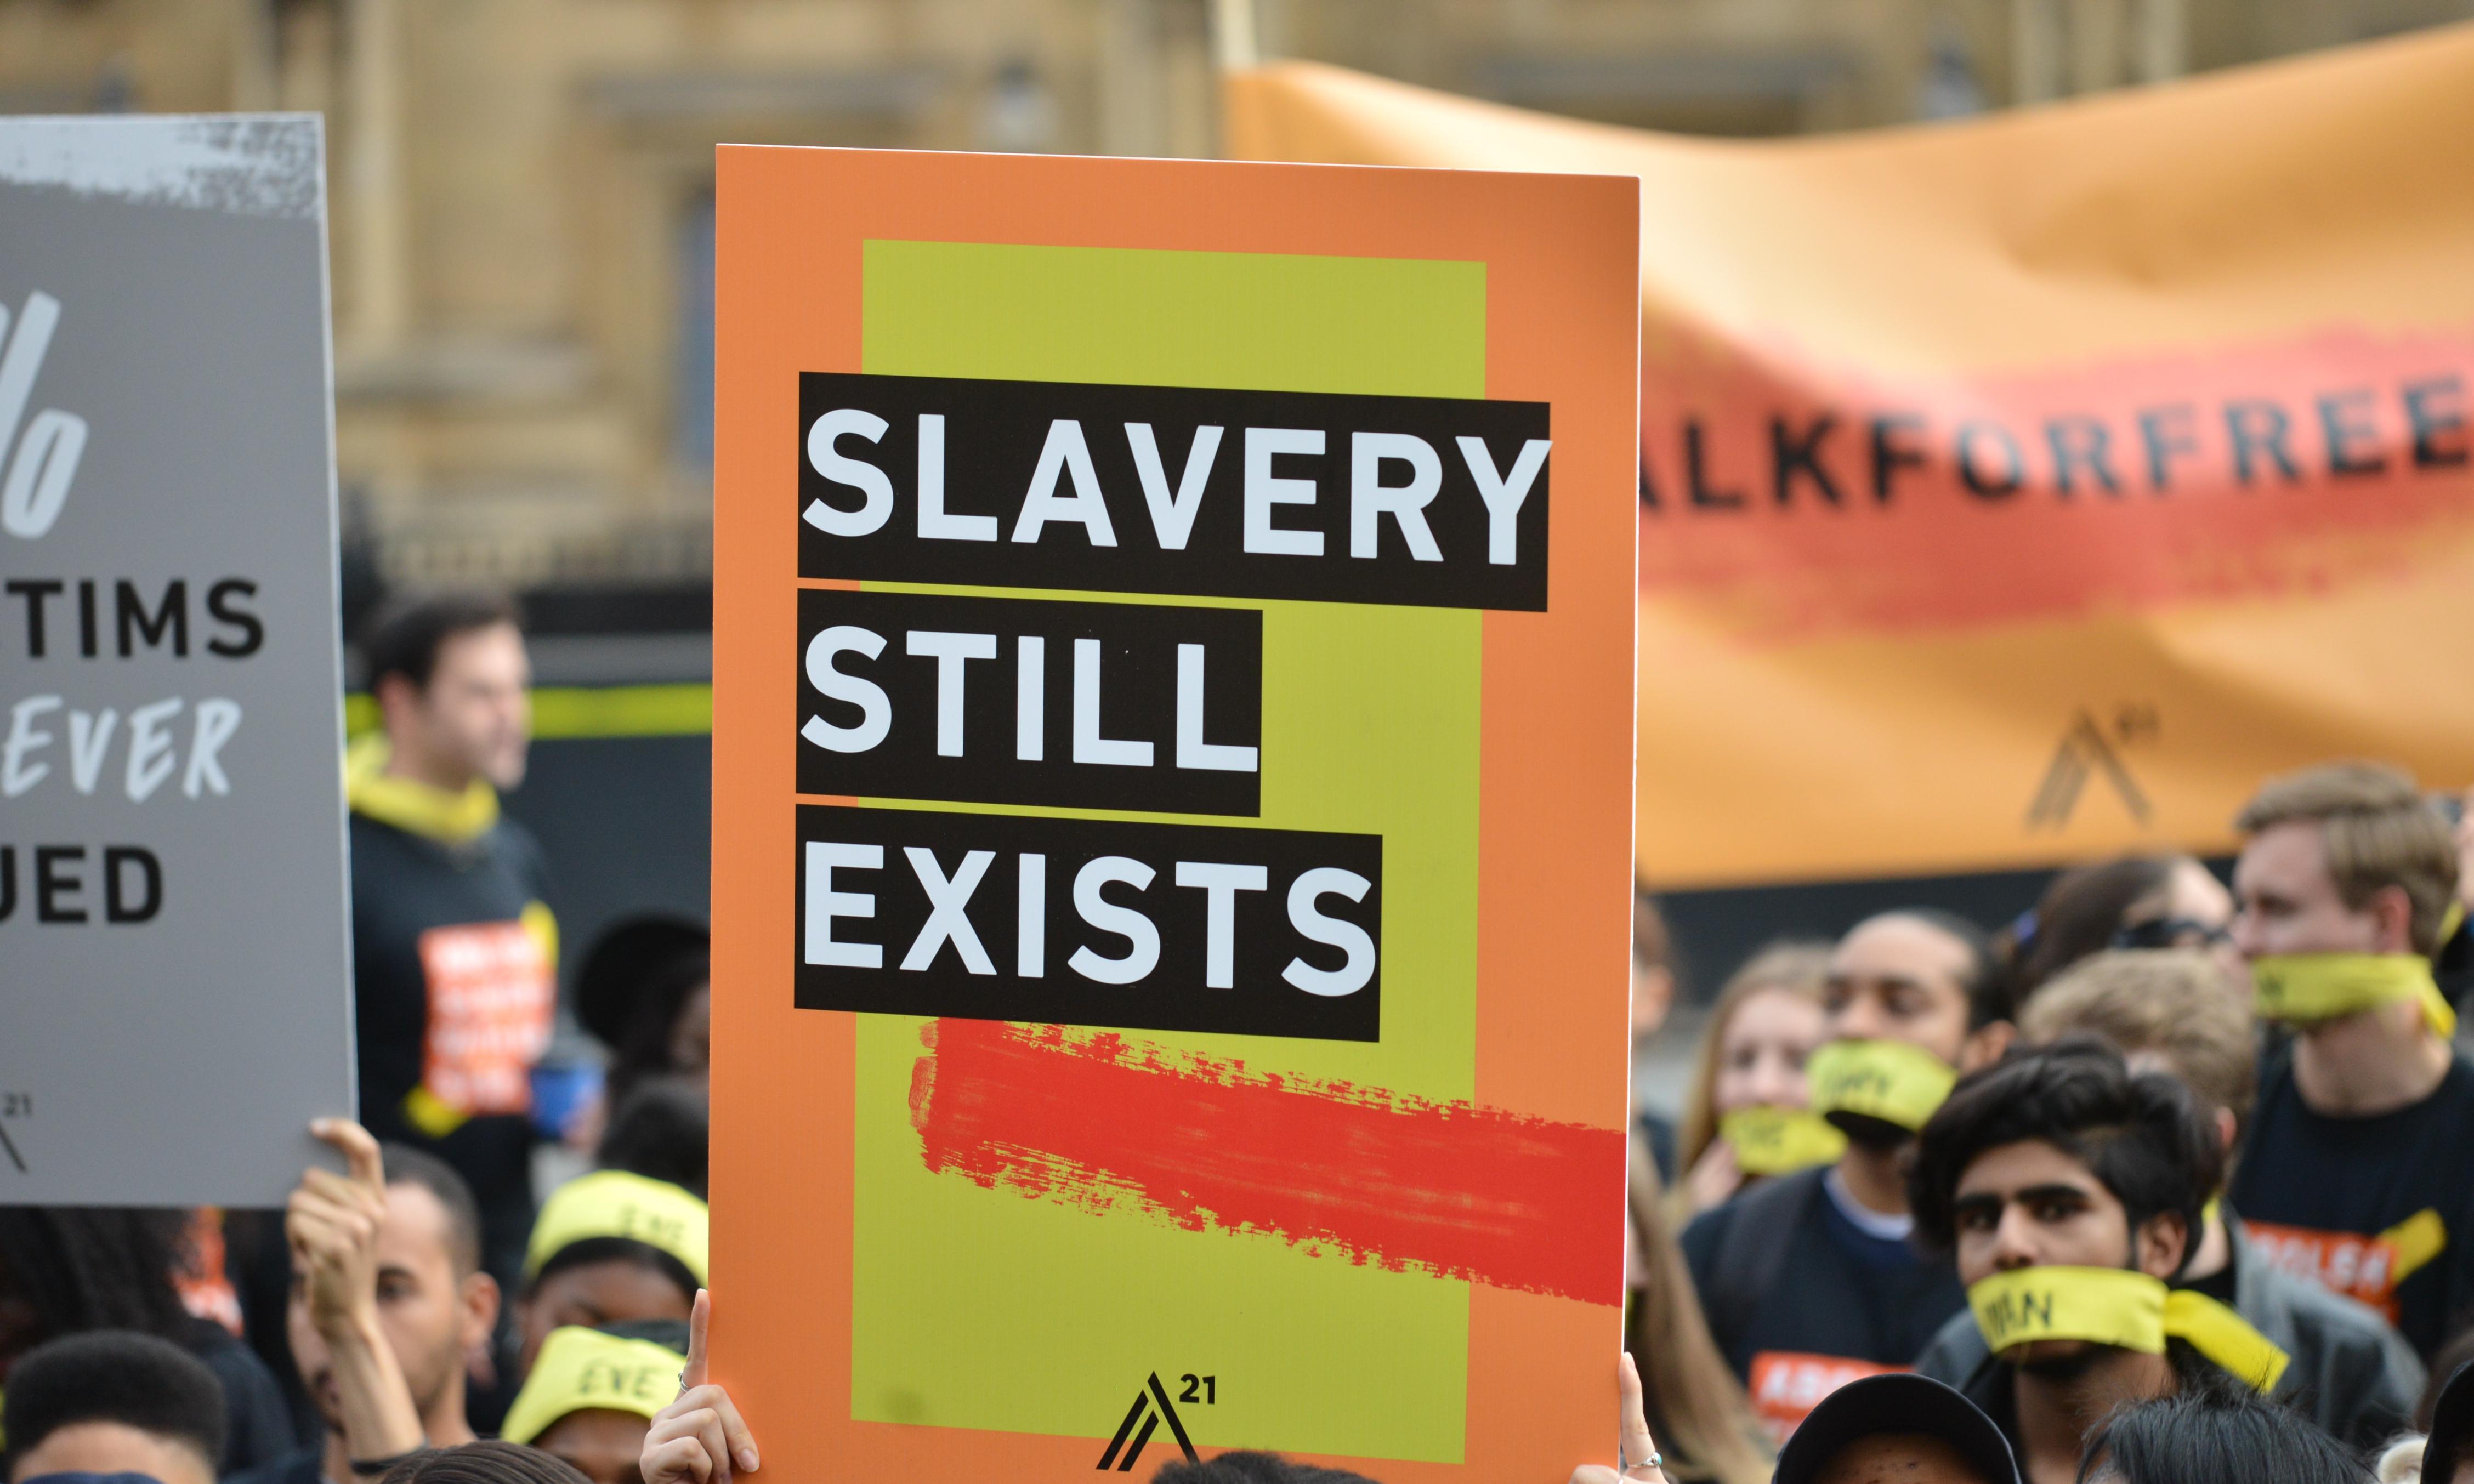 Australia warned 'discriminatory migration policies' may be driving slavery